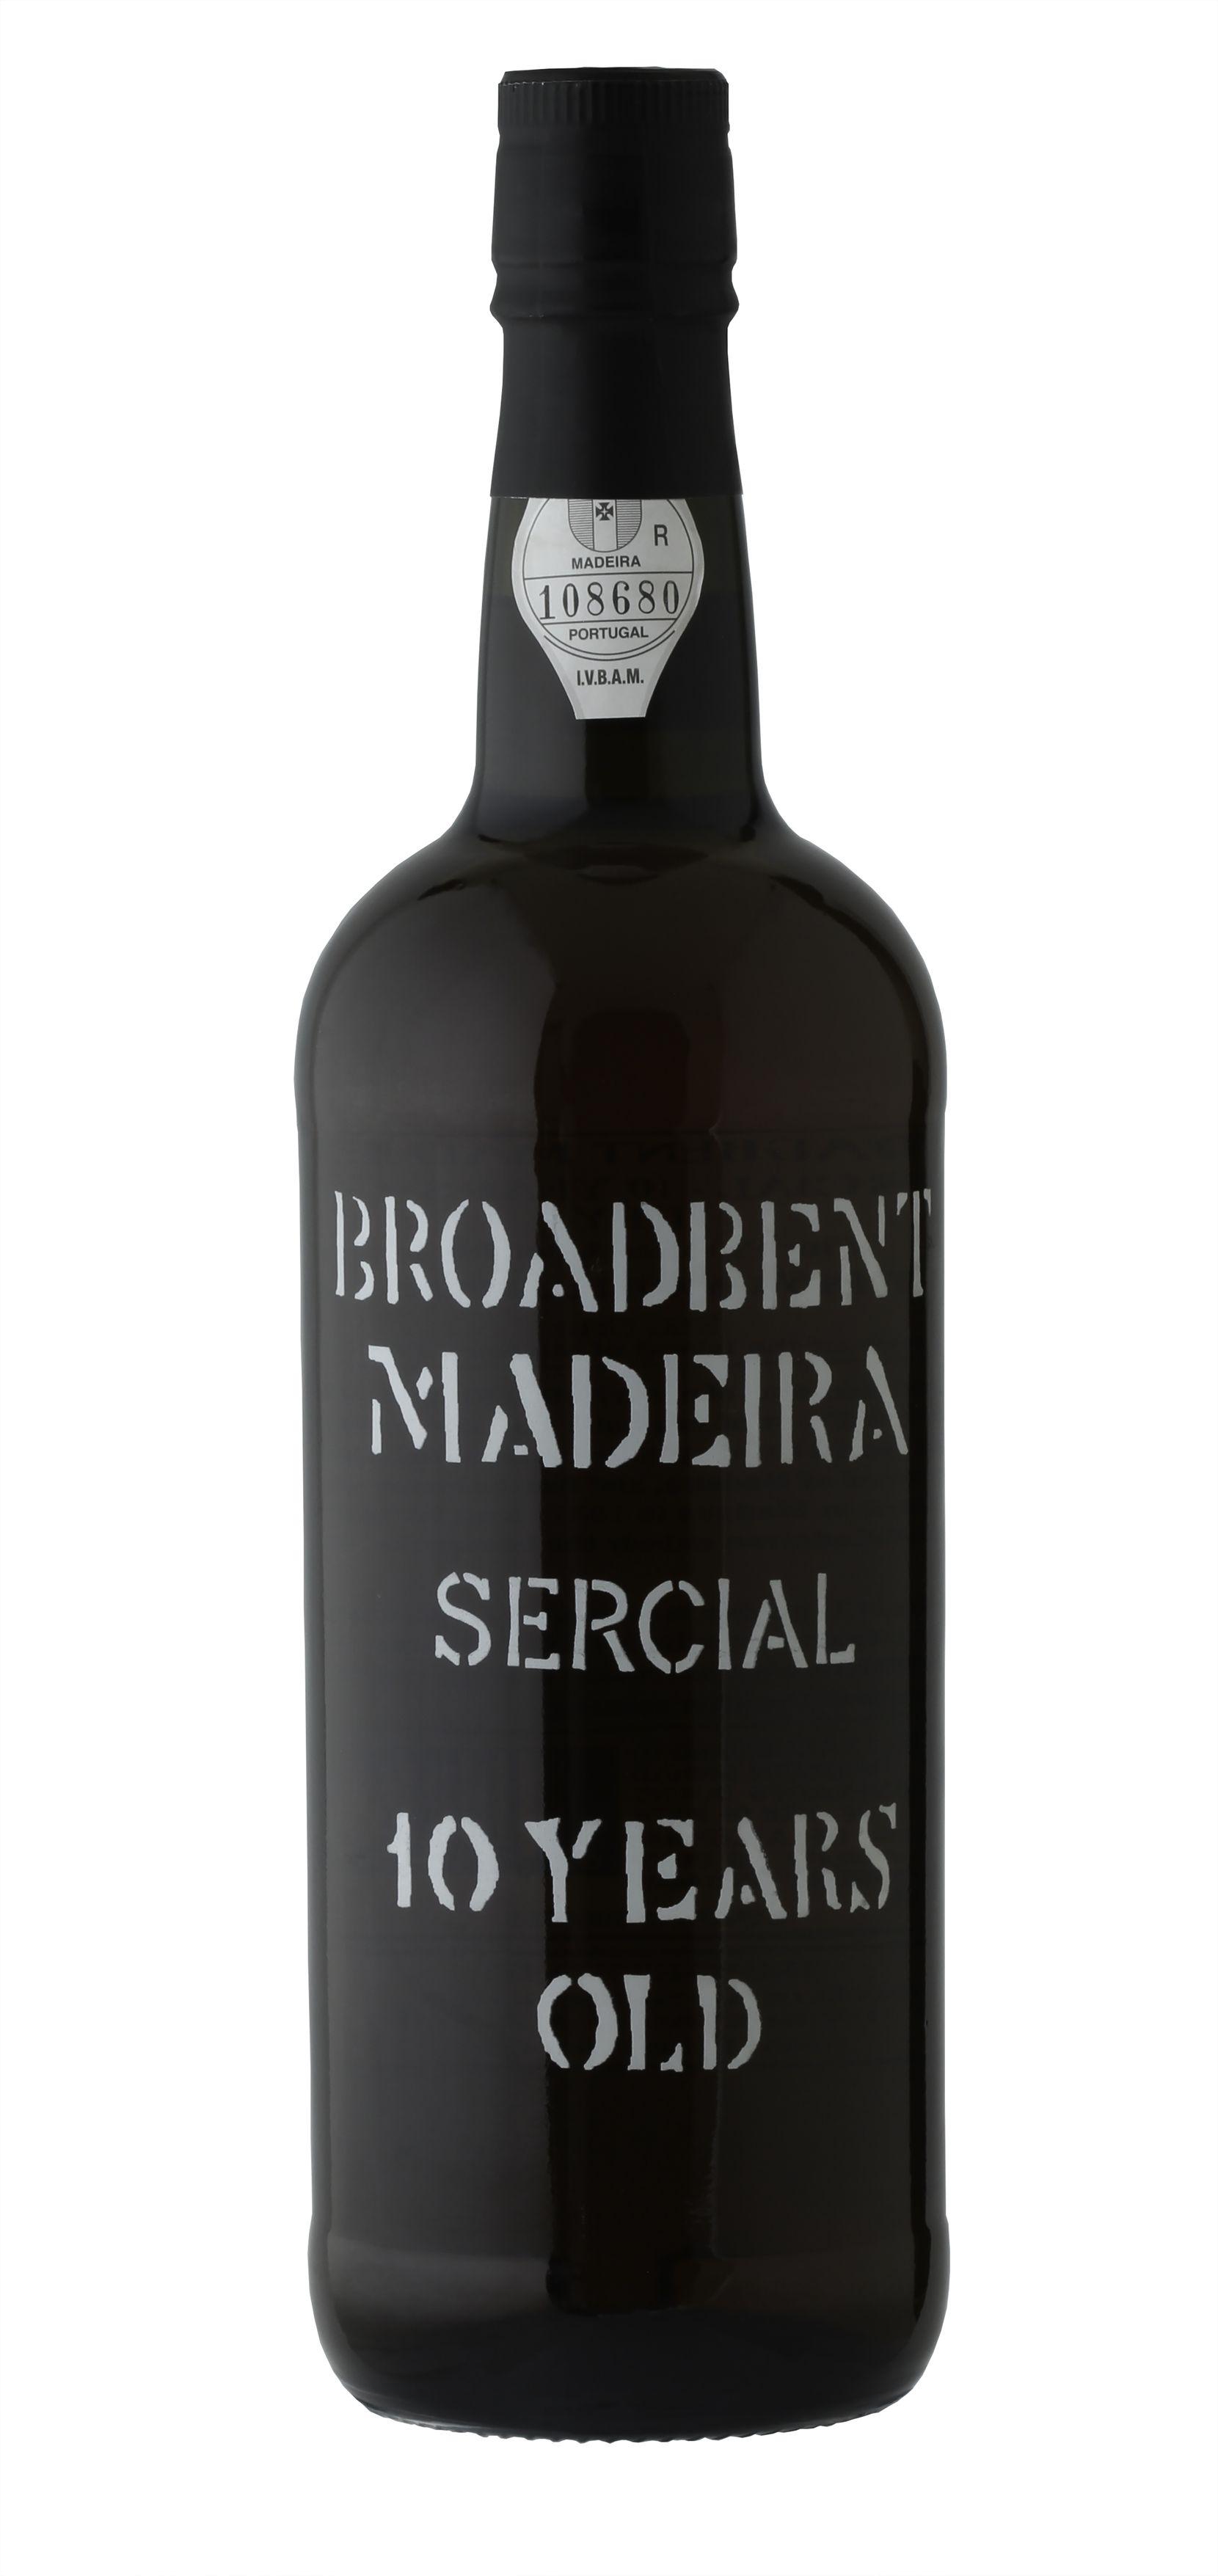 Broadbent Sercial Madeira 10-Year-Old, NV, Portugal